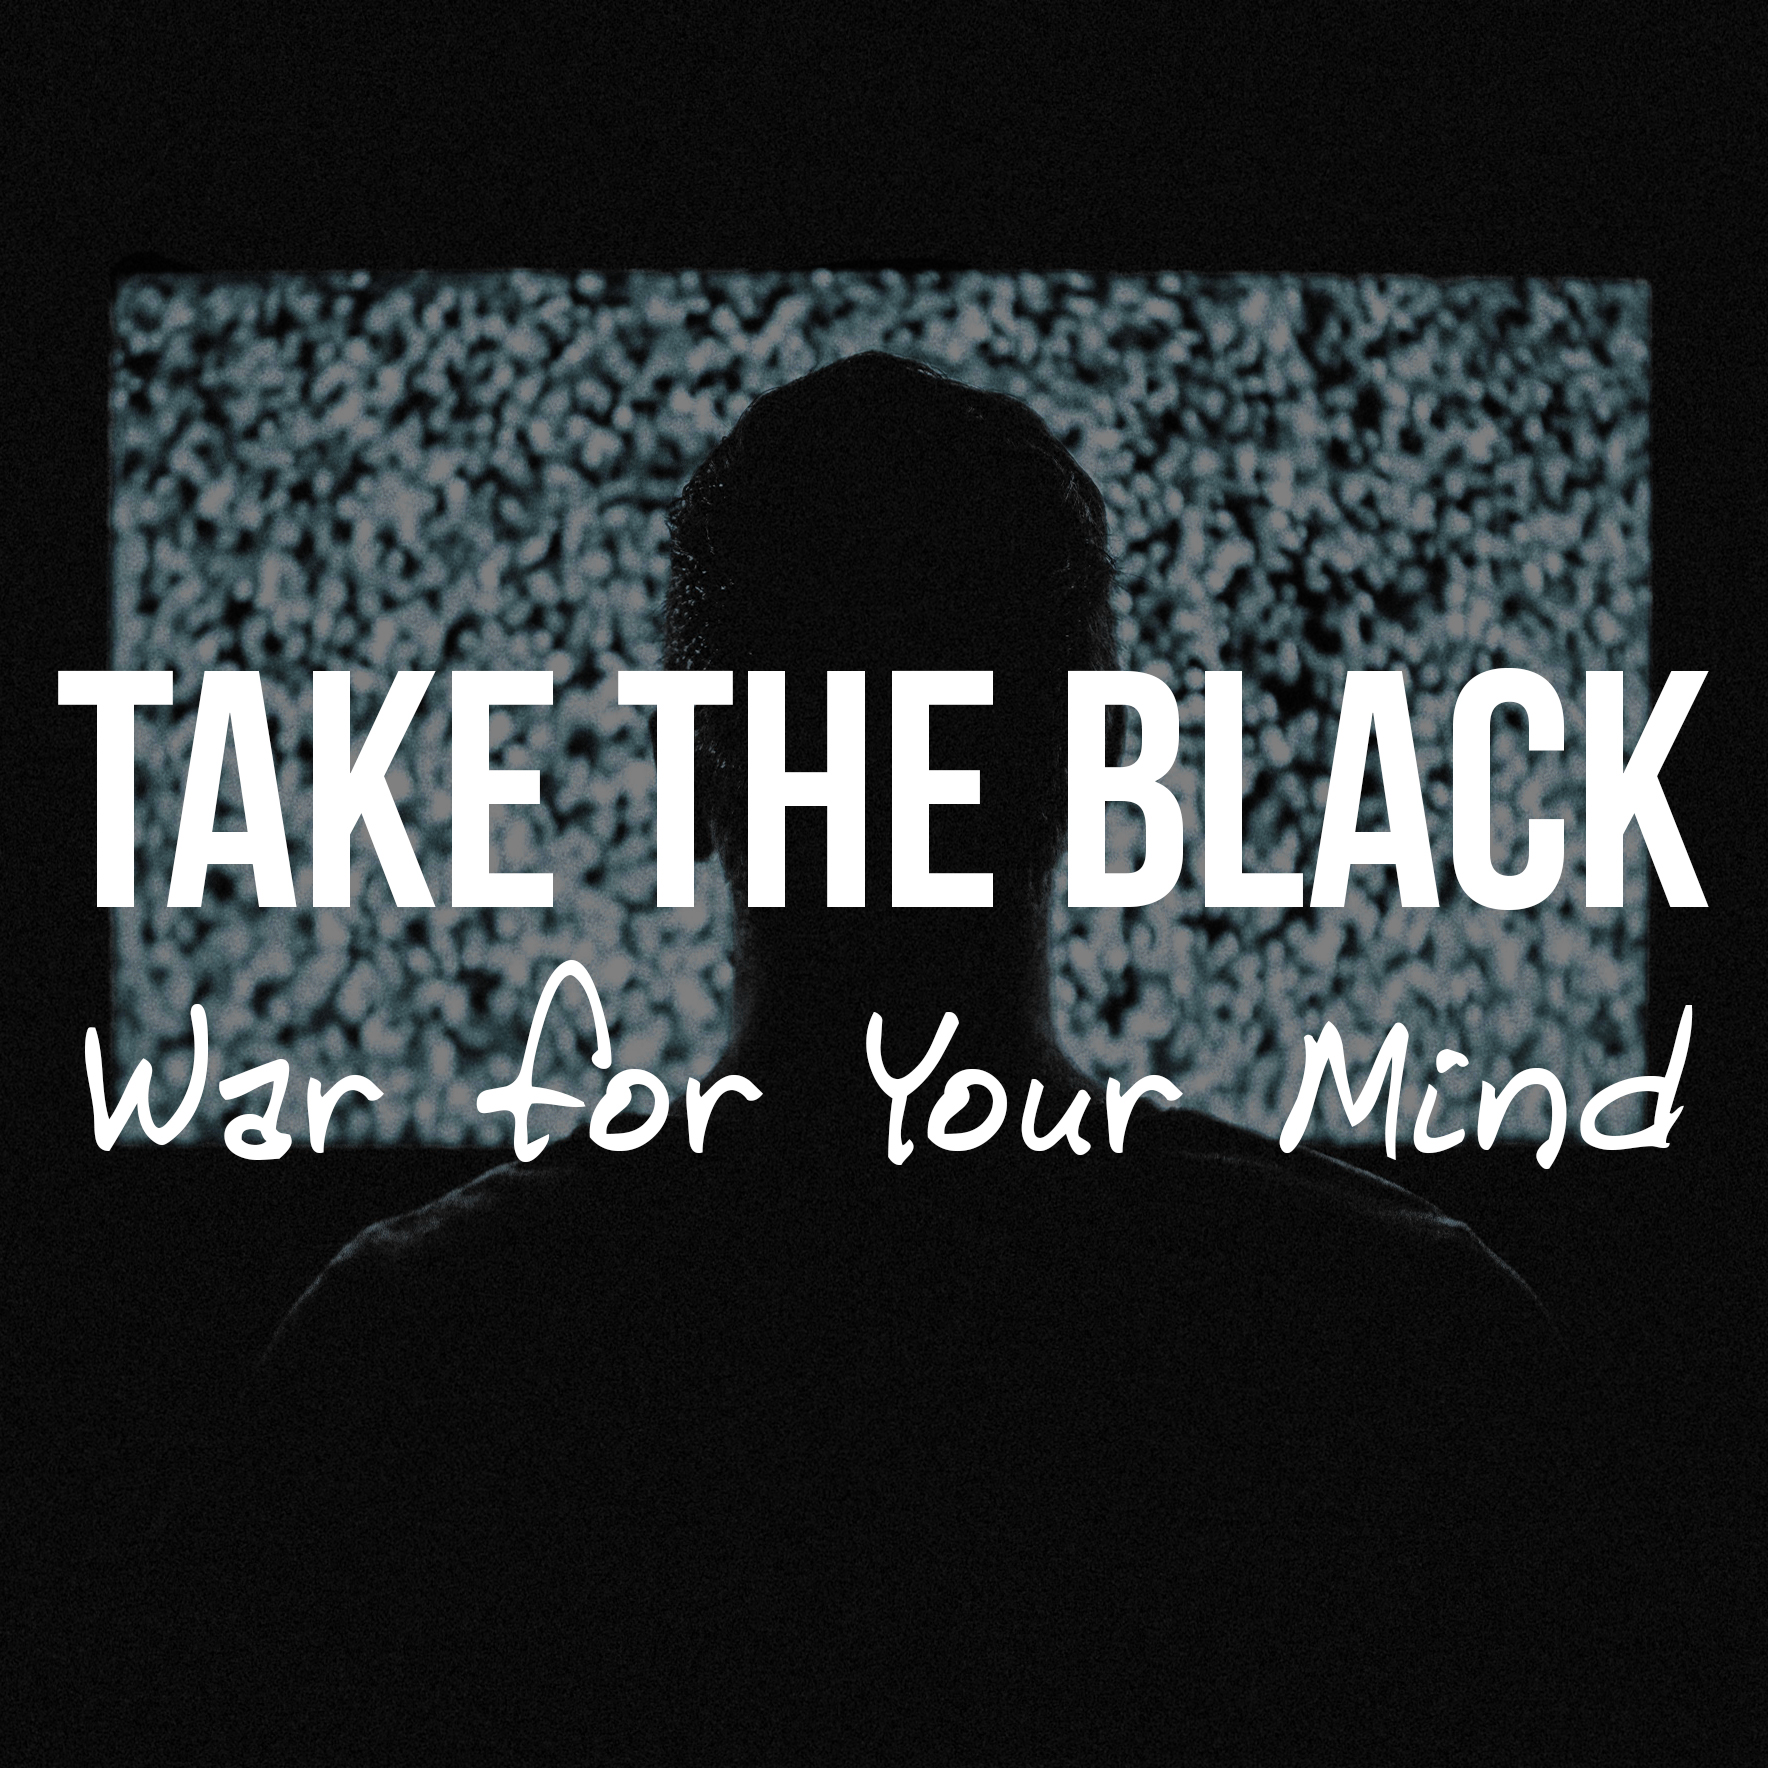 War for Your Mind.jpg